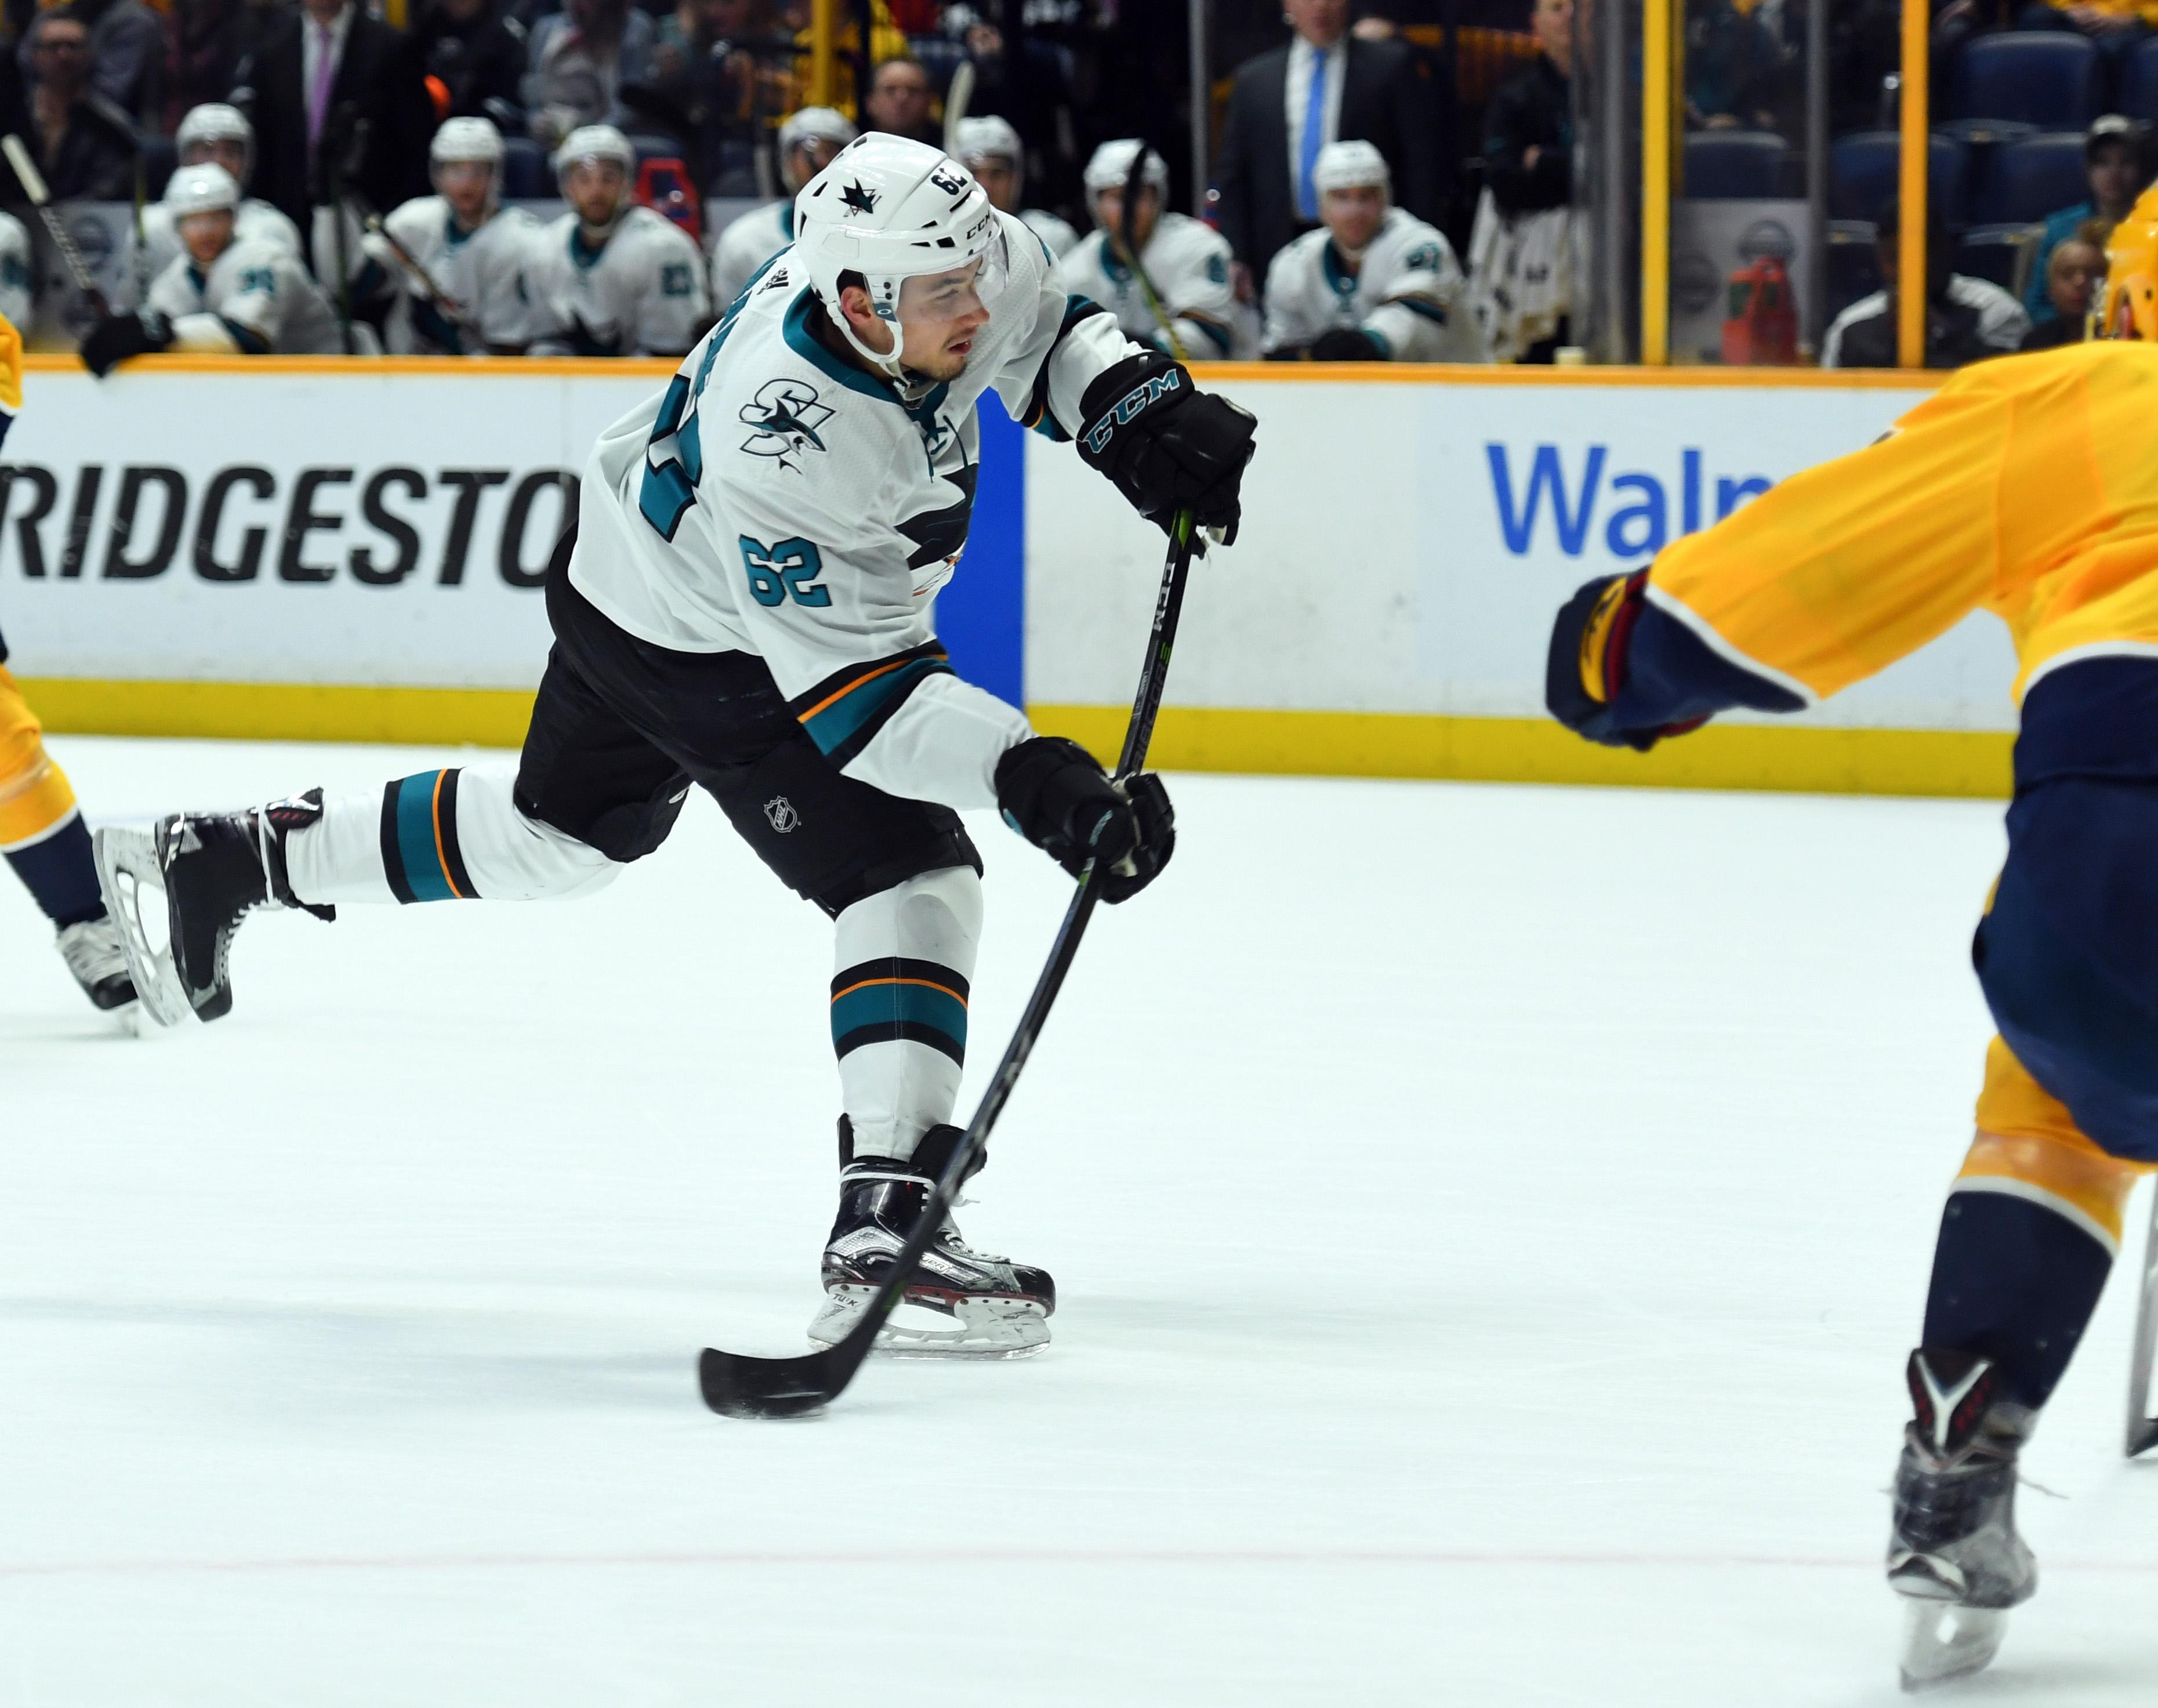 Feb 22, 2018; Nashville, TN, USA; San Jose Sharks right wing Kevin Labanc (62) shoots the puck during the second period against the Nashville Predators at Bridgestone Arena.